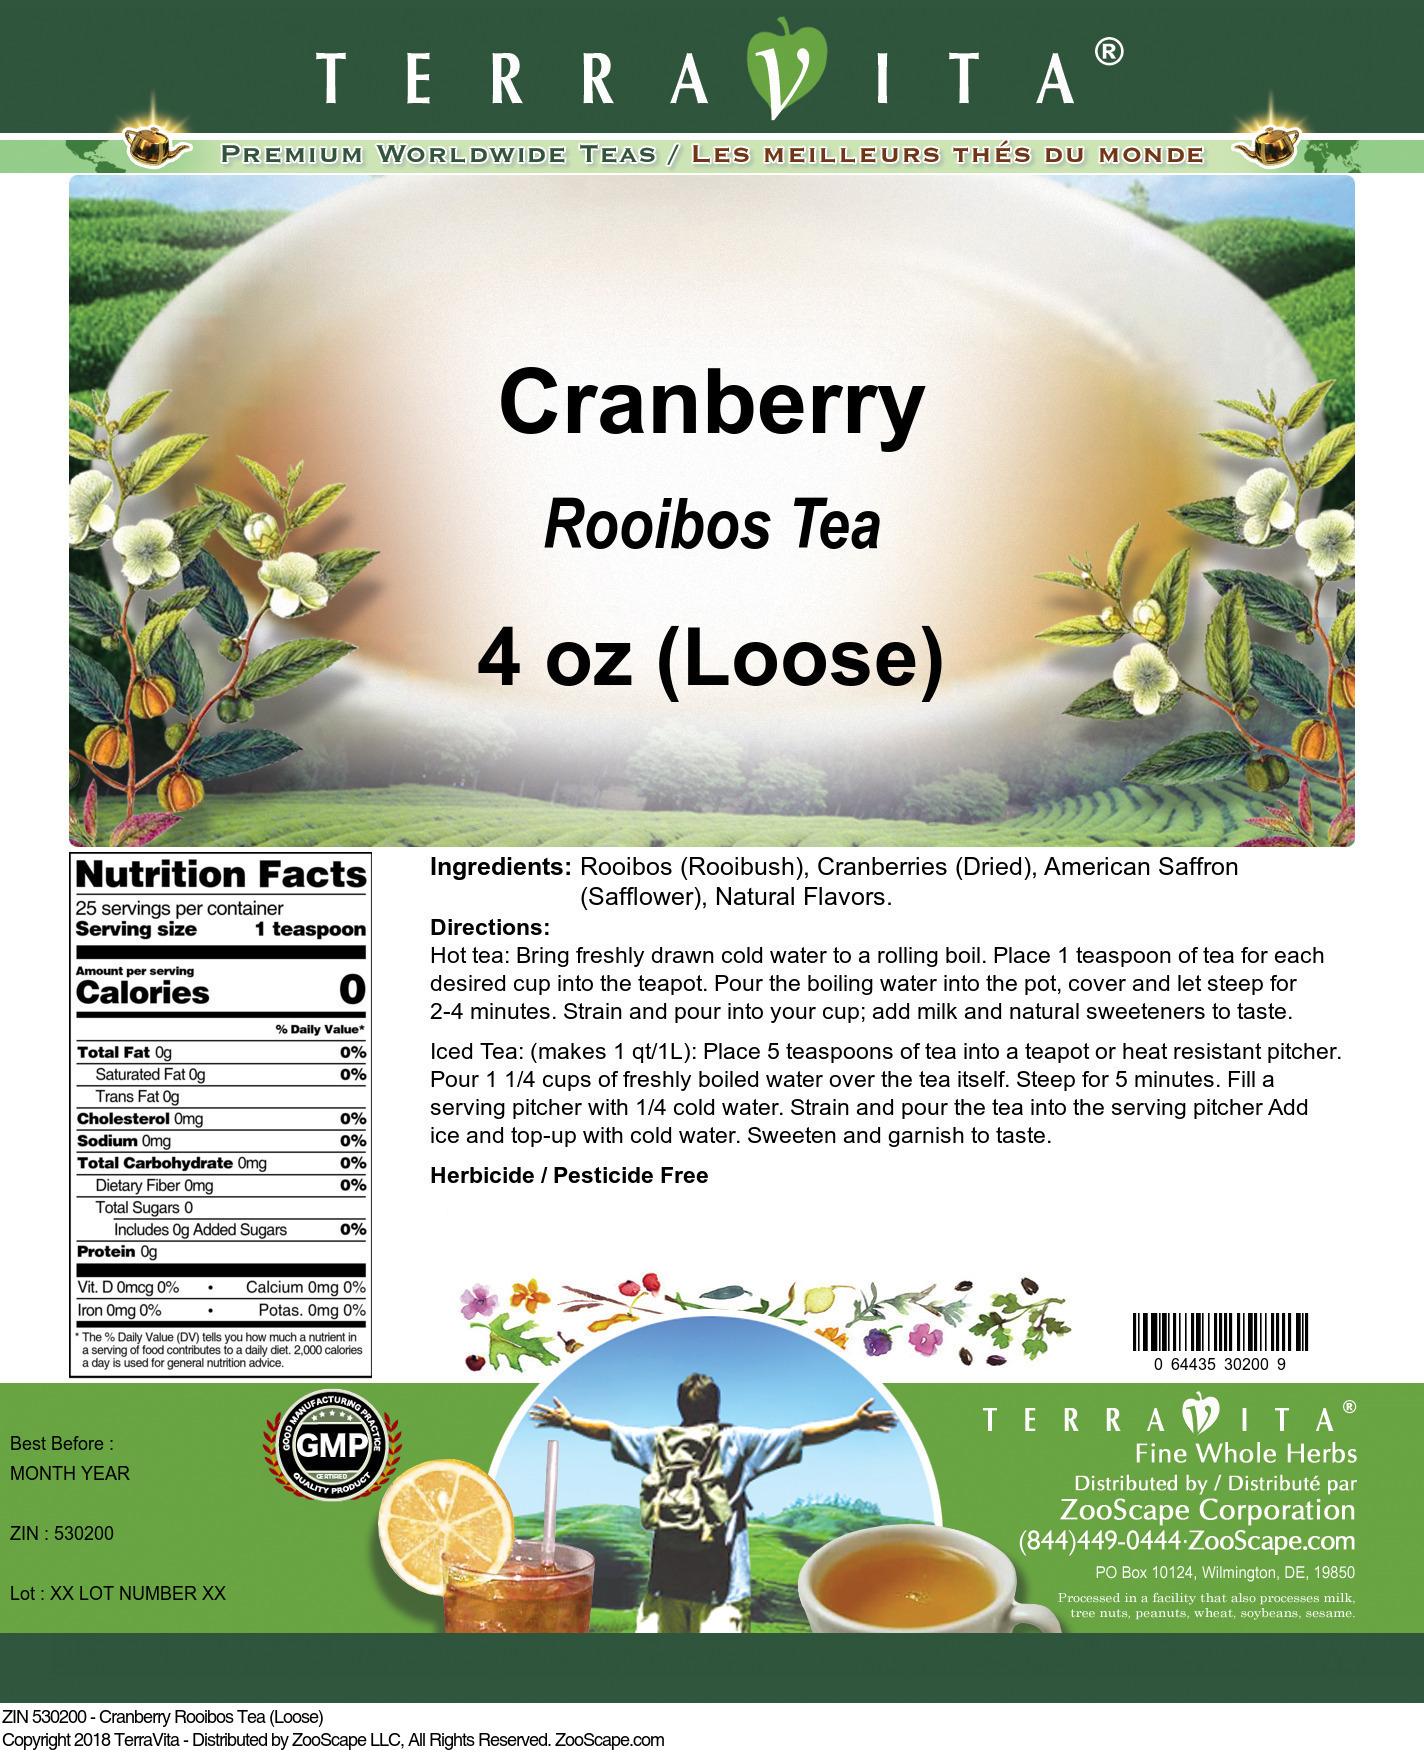 Cranberry Rooibos Tea (Loose)